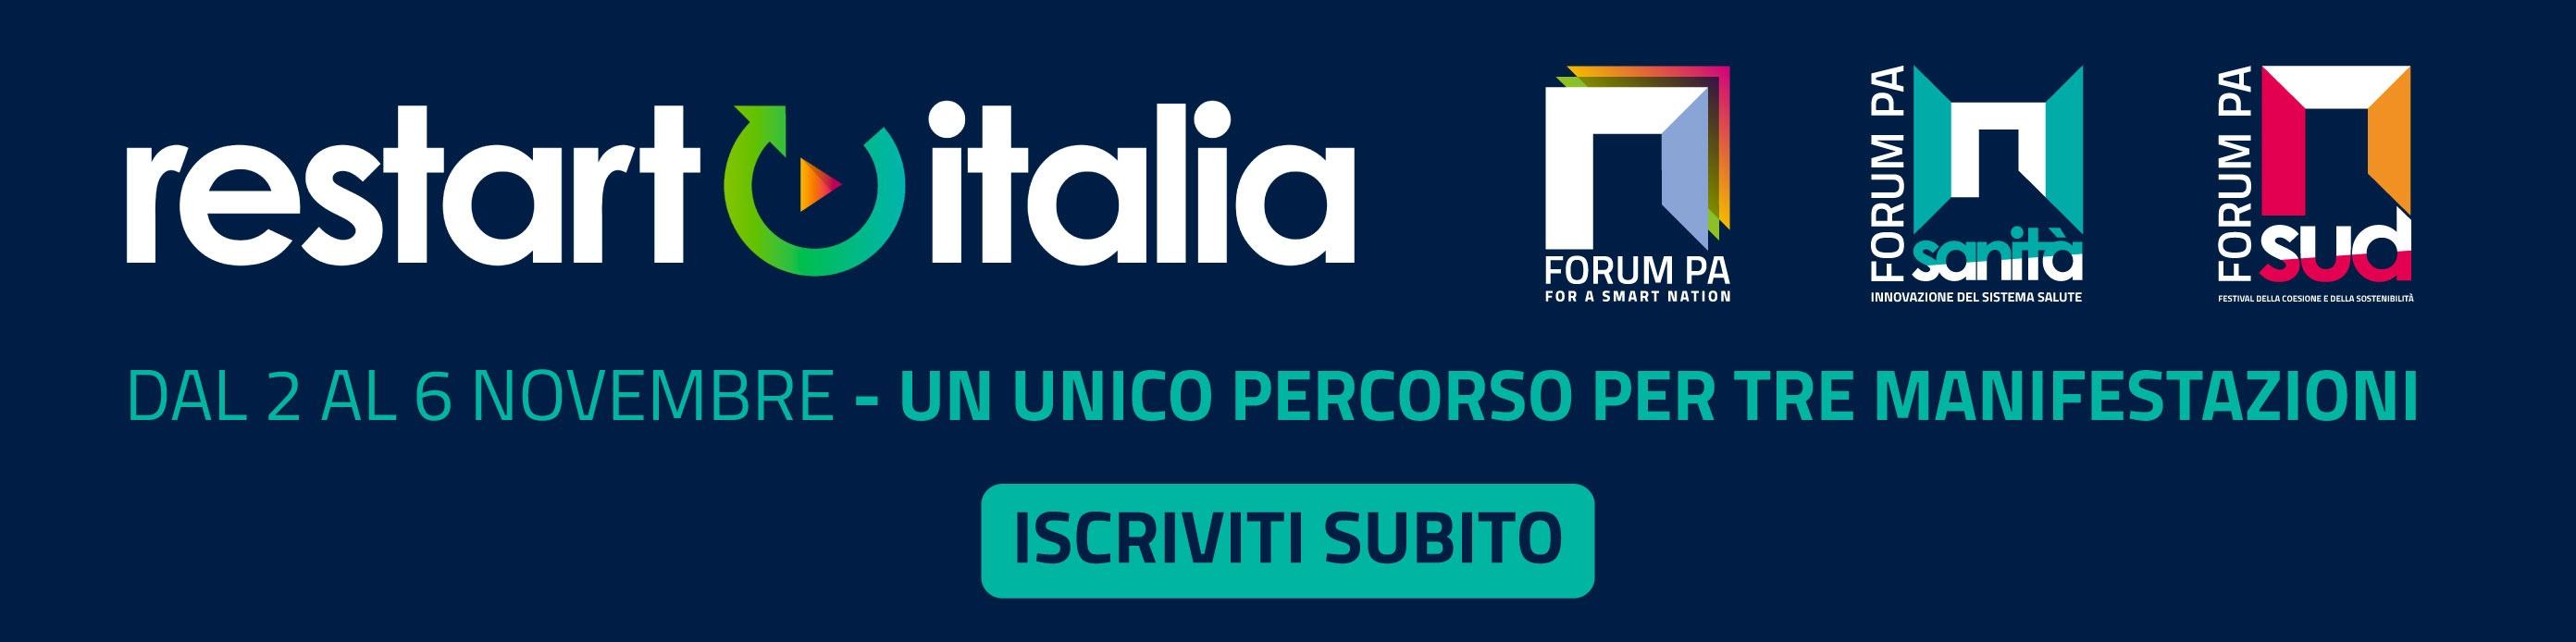 ForumPa Restart Italia - Dal 2 al 6 novembre